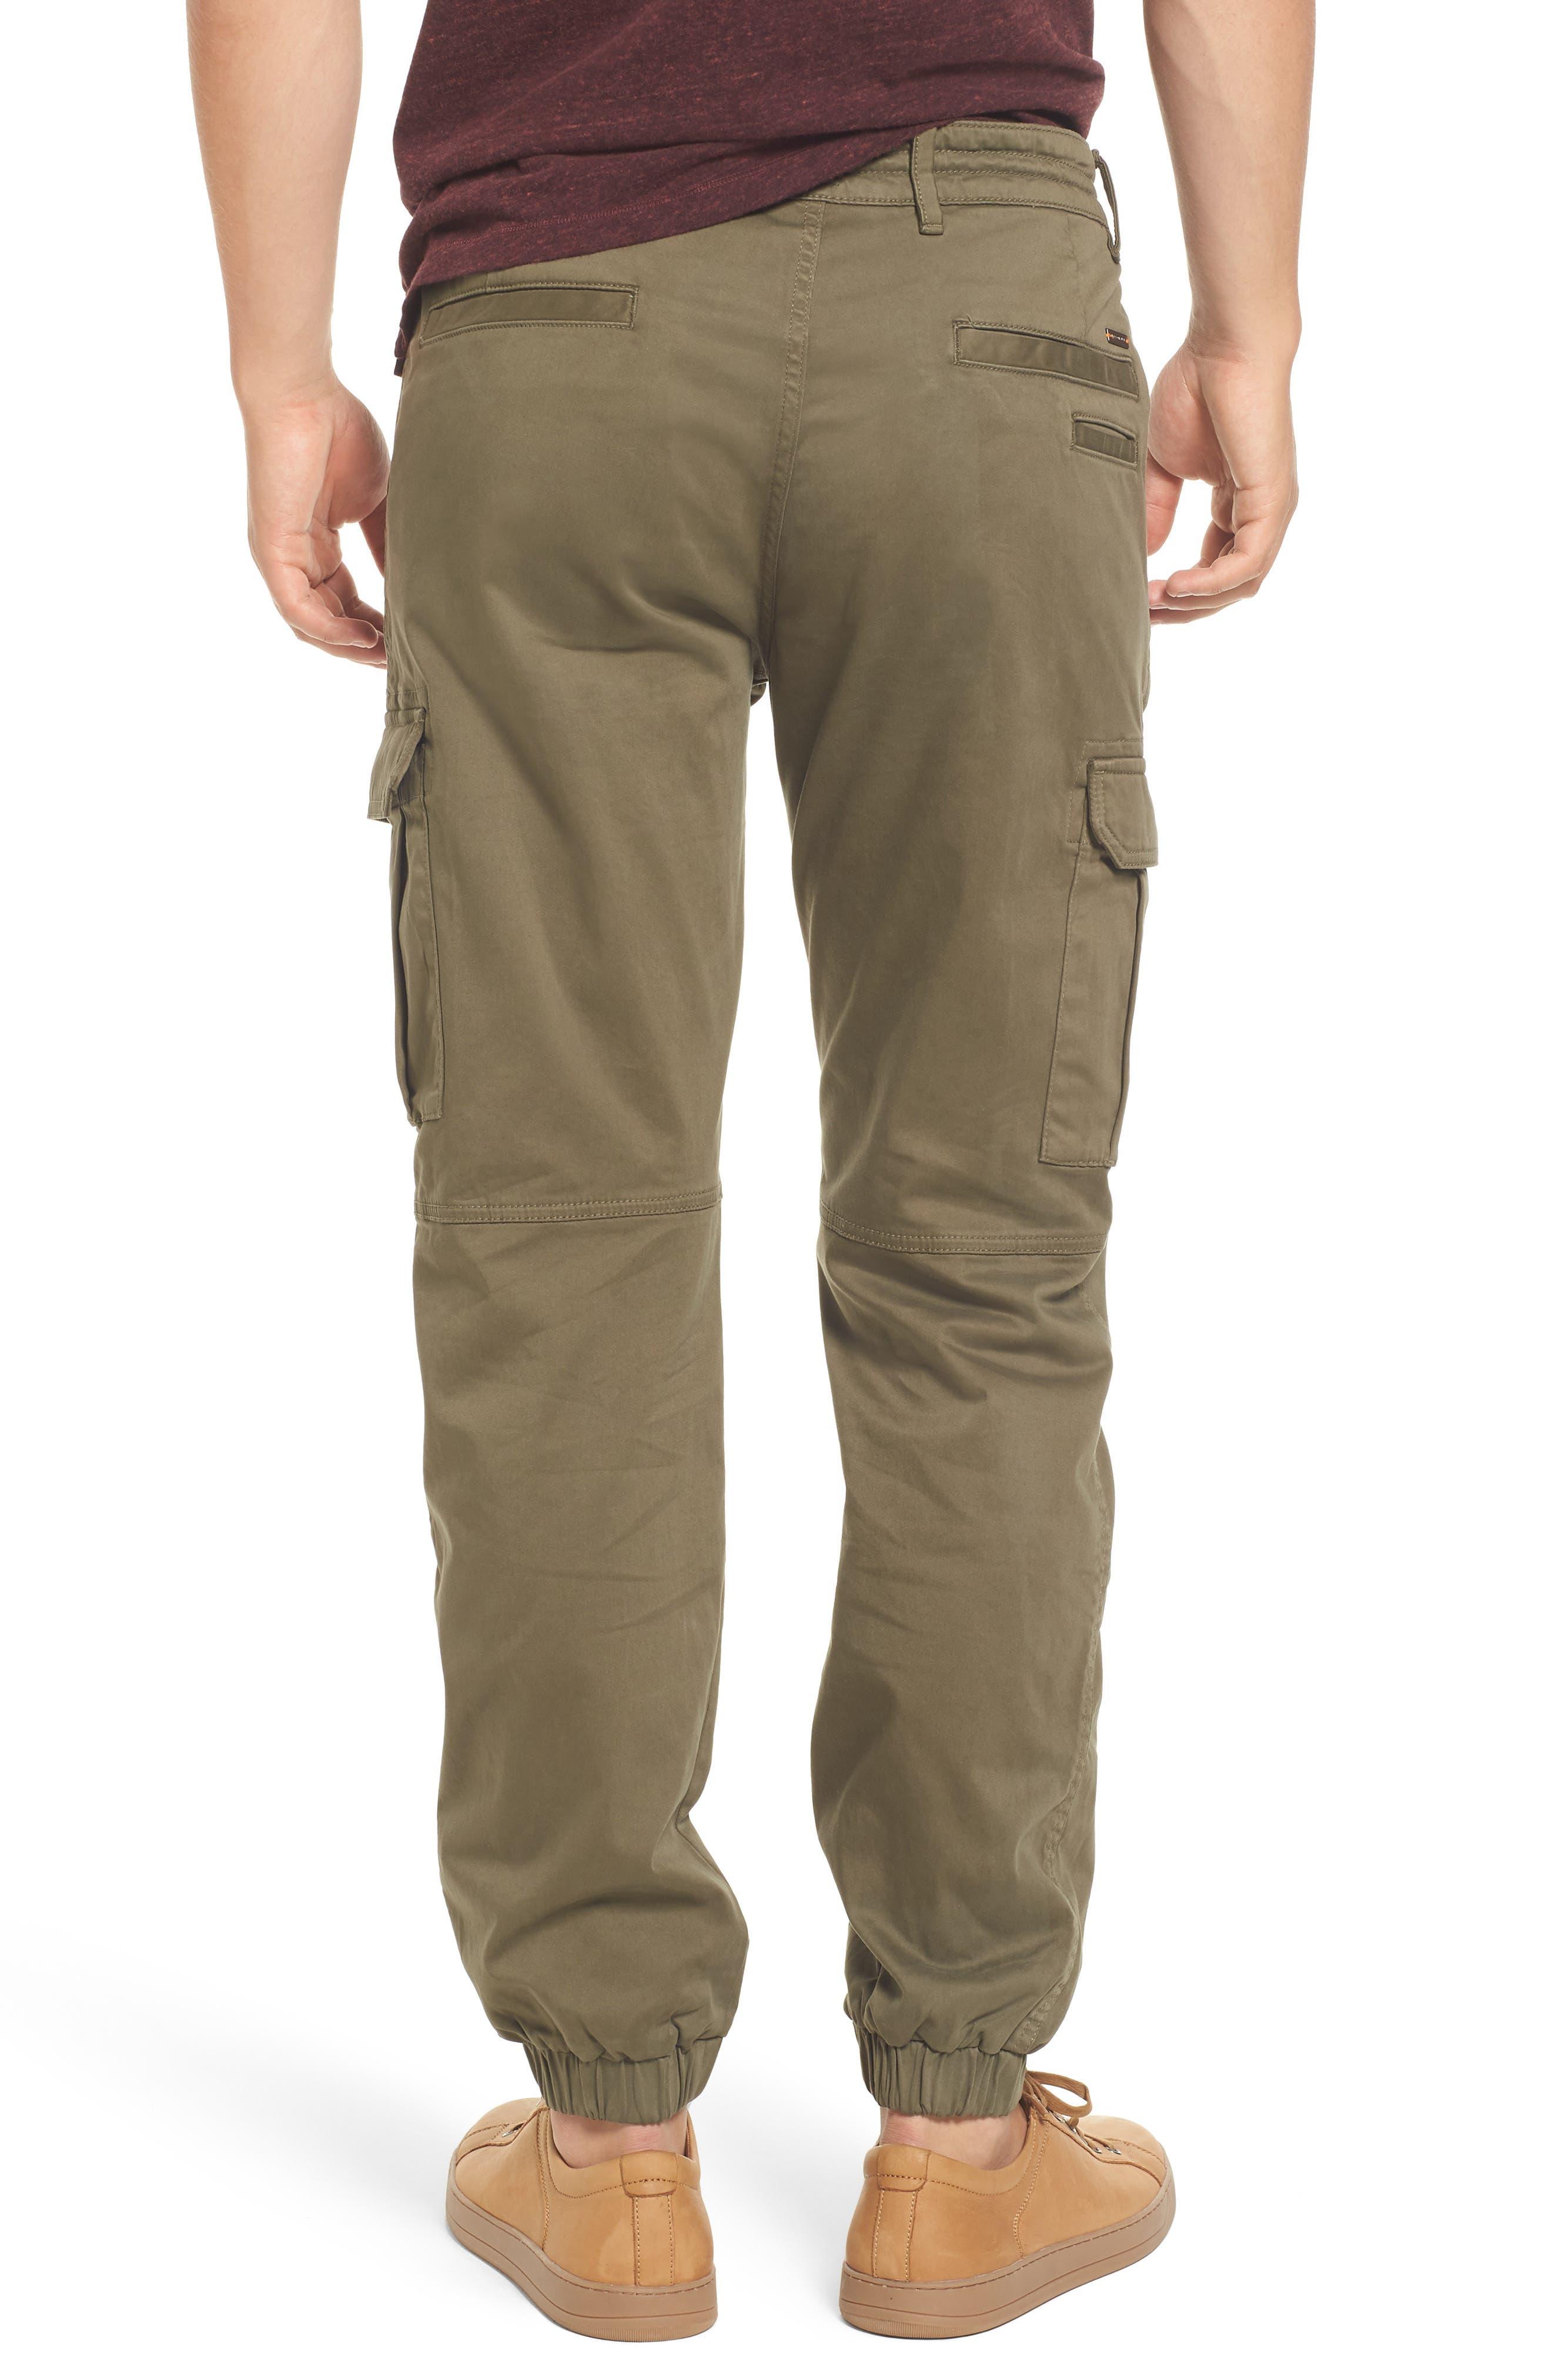 Shay 2 Cargo Pants,                             Alternate thumbnail 4, color,